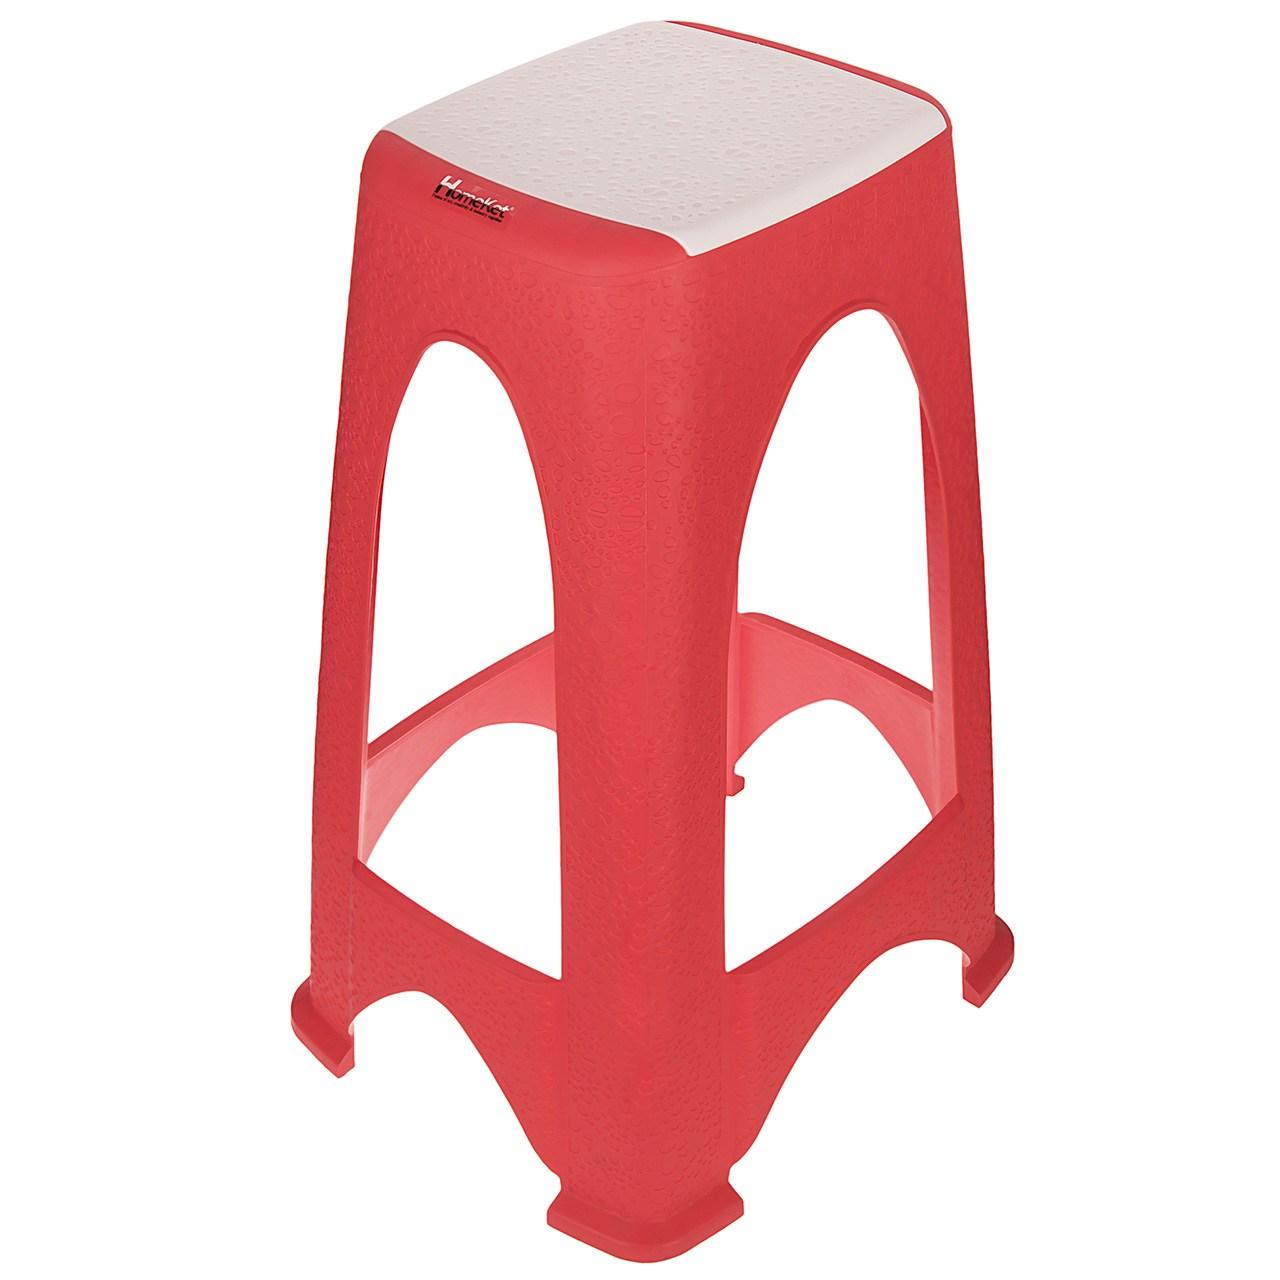 چهارپایه هوم کت کد 4196